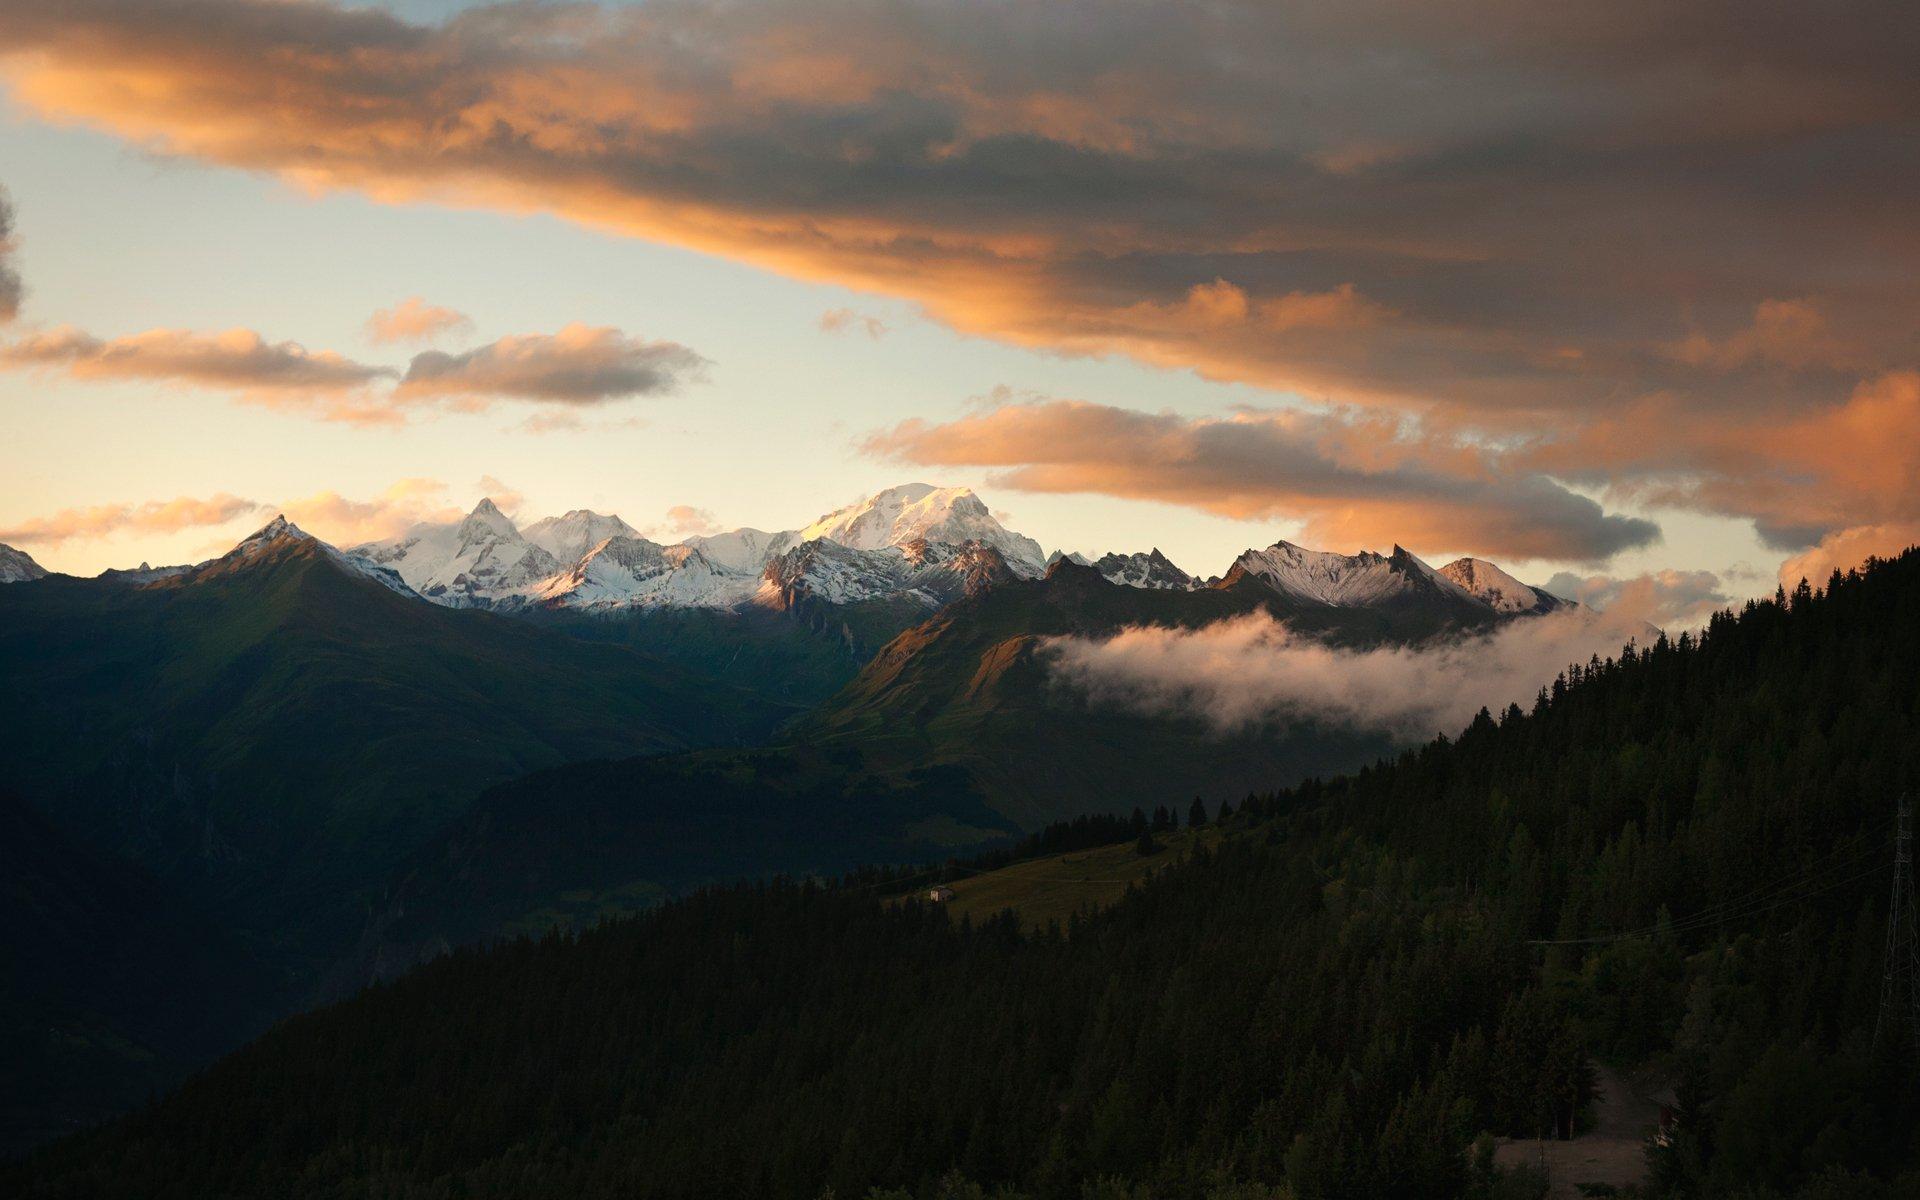 Mont Blanc Fond D Ecran Hd Arriere Plan 1920x1200 Id 225016 Wallpaper Abyss